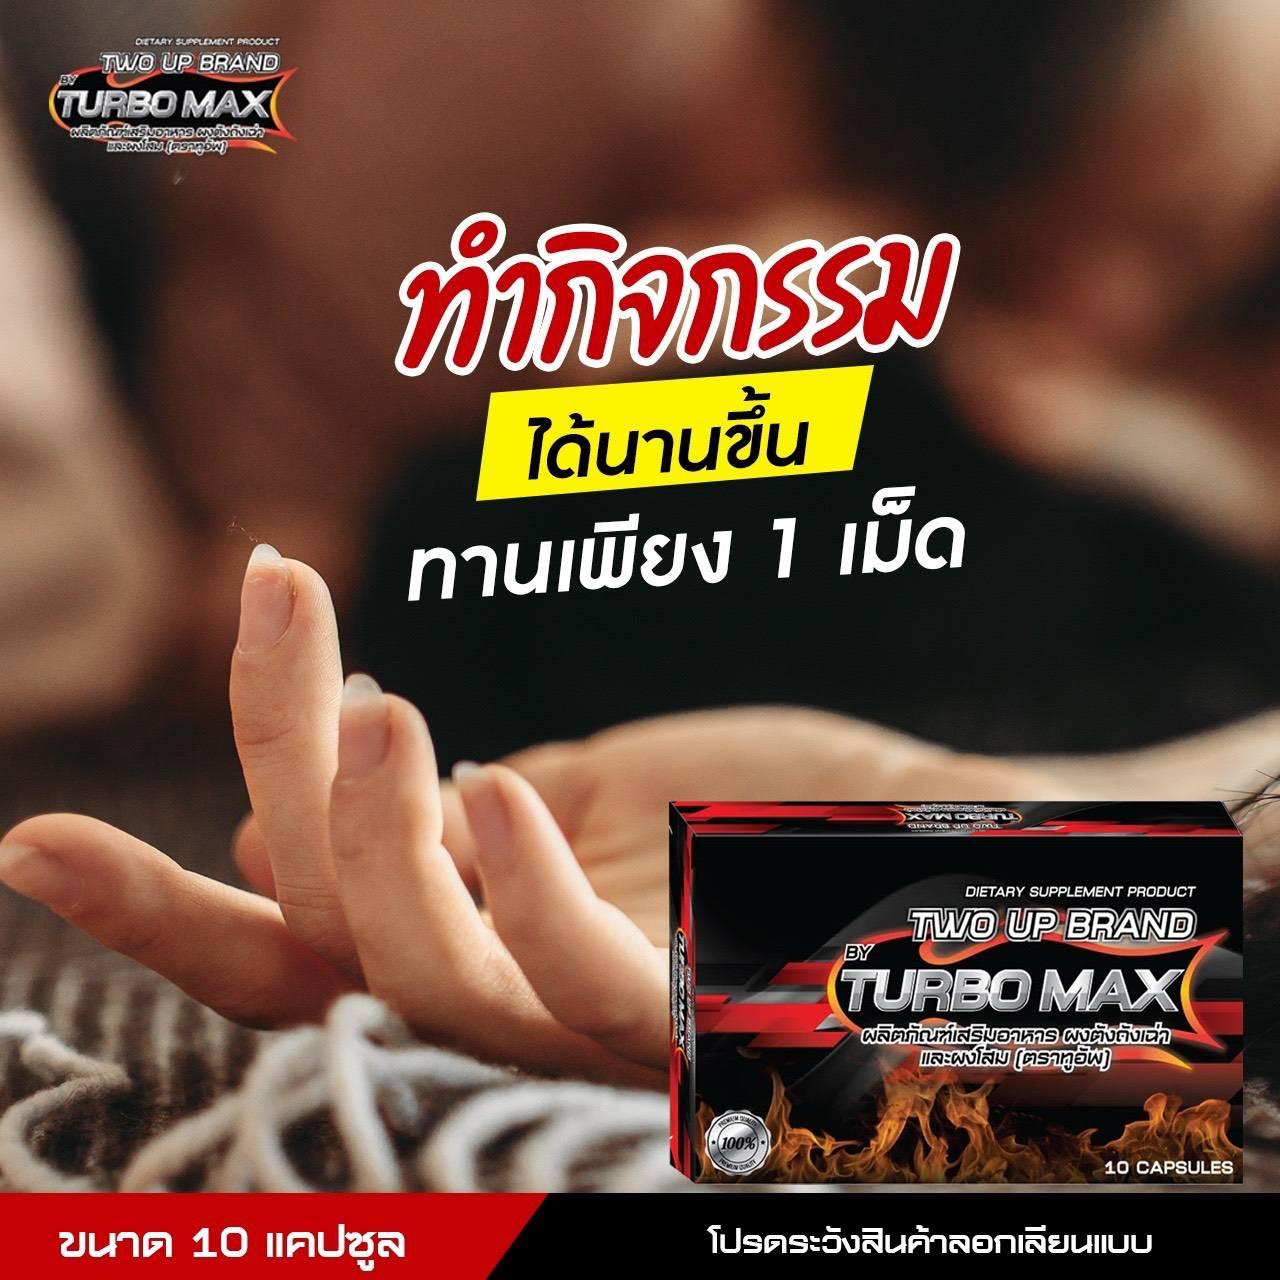 New TWO UP By Turbo Max เทอร์โบ แม็กซ์ อาหารเสริมท่านชาย สูตรใหม่เร้าใจกว่าเดิม บรรจุ 10 แคปซูล